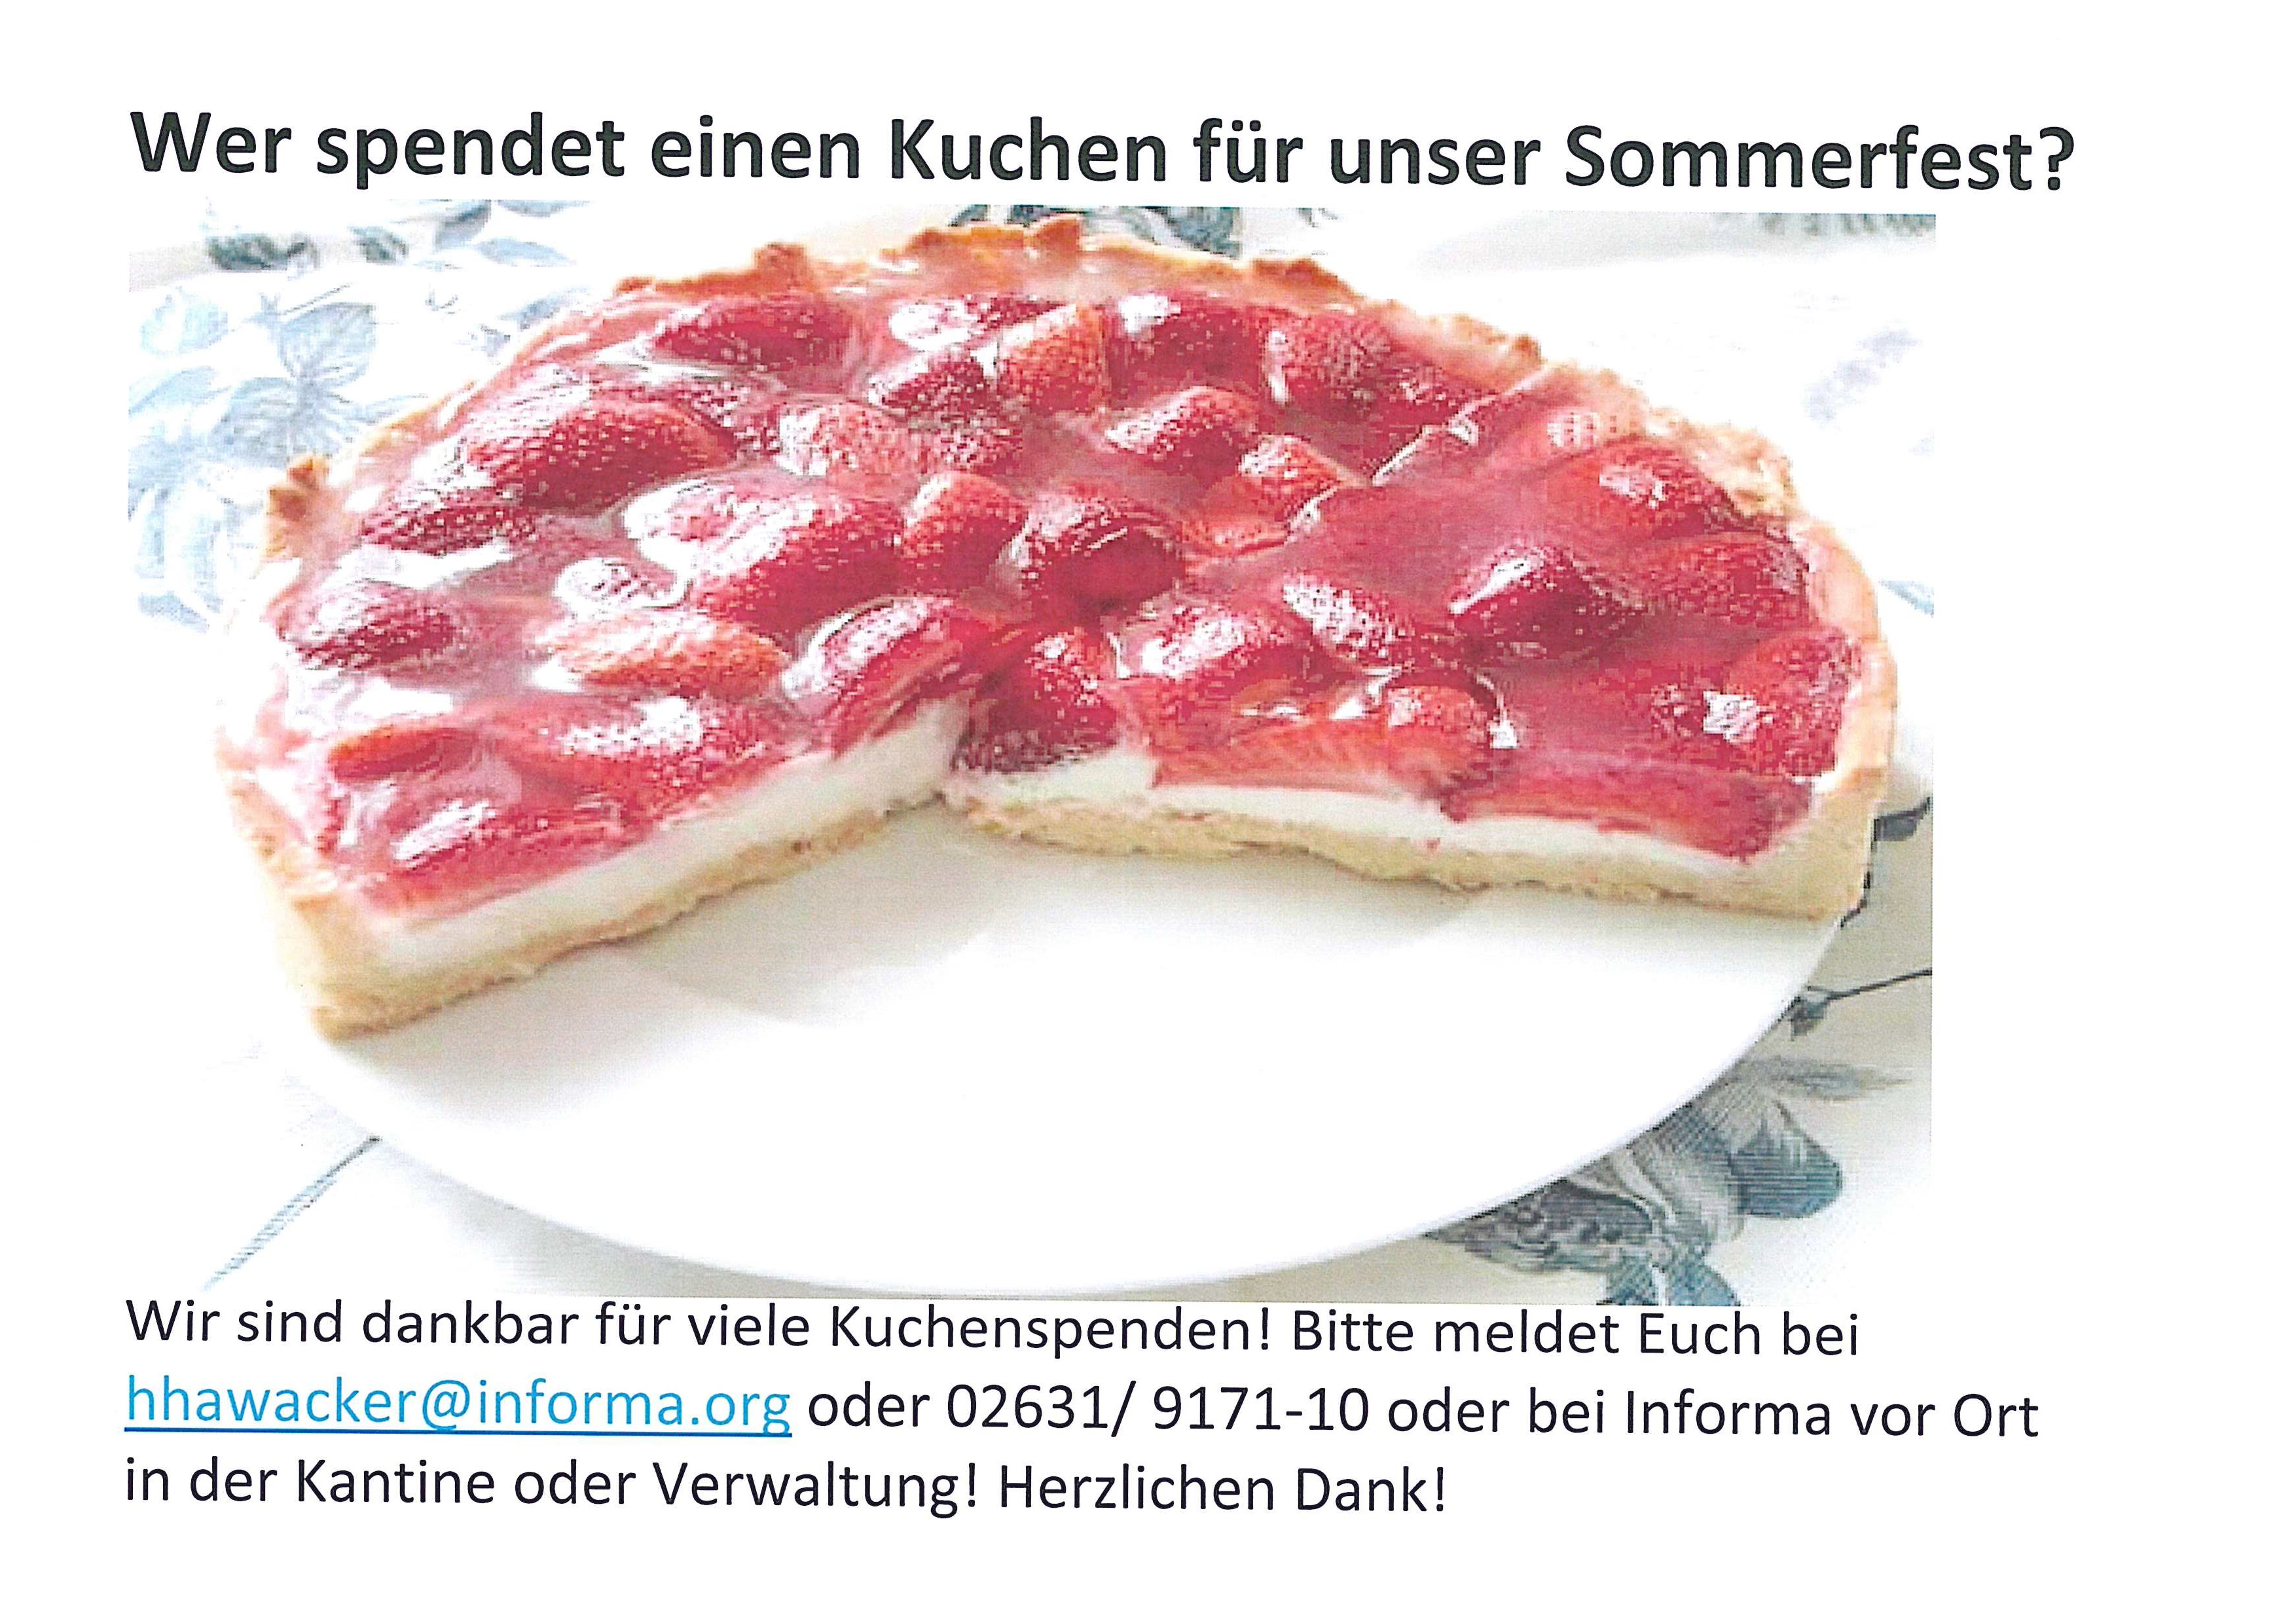 http://informa.org/cms/wp-content/uploads/2018/05/Kuchenspende.jpg